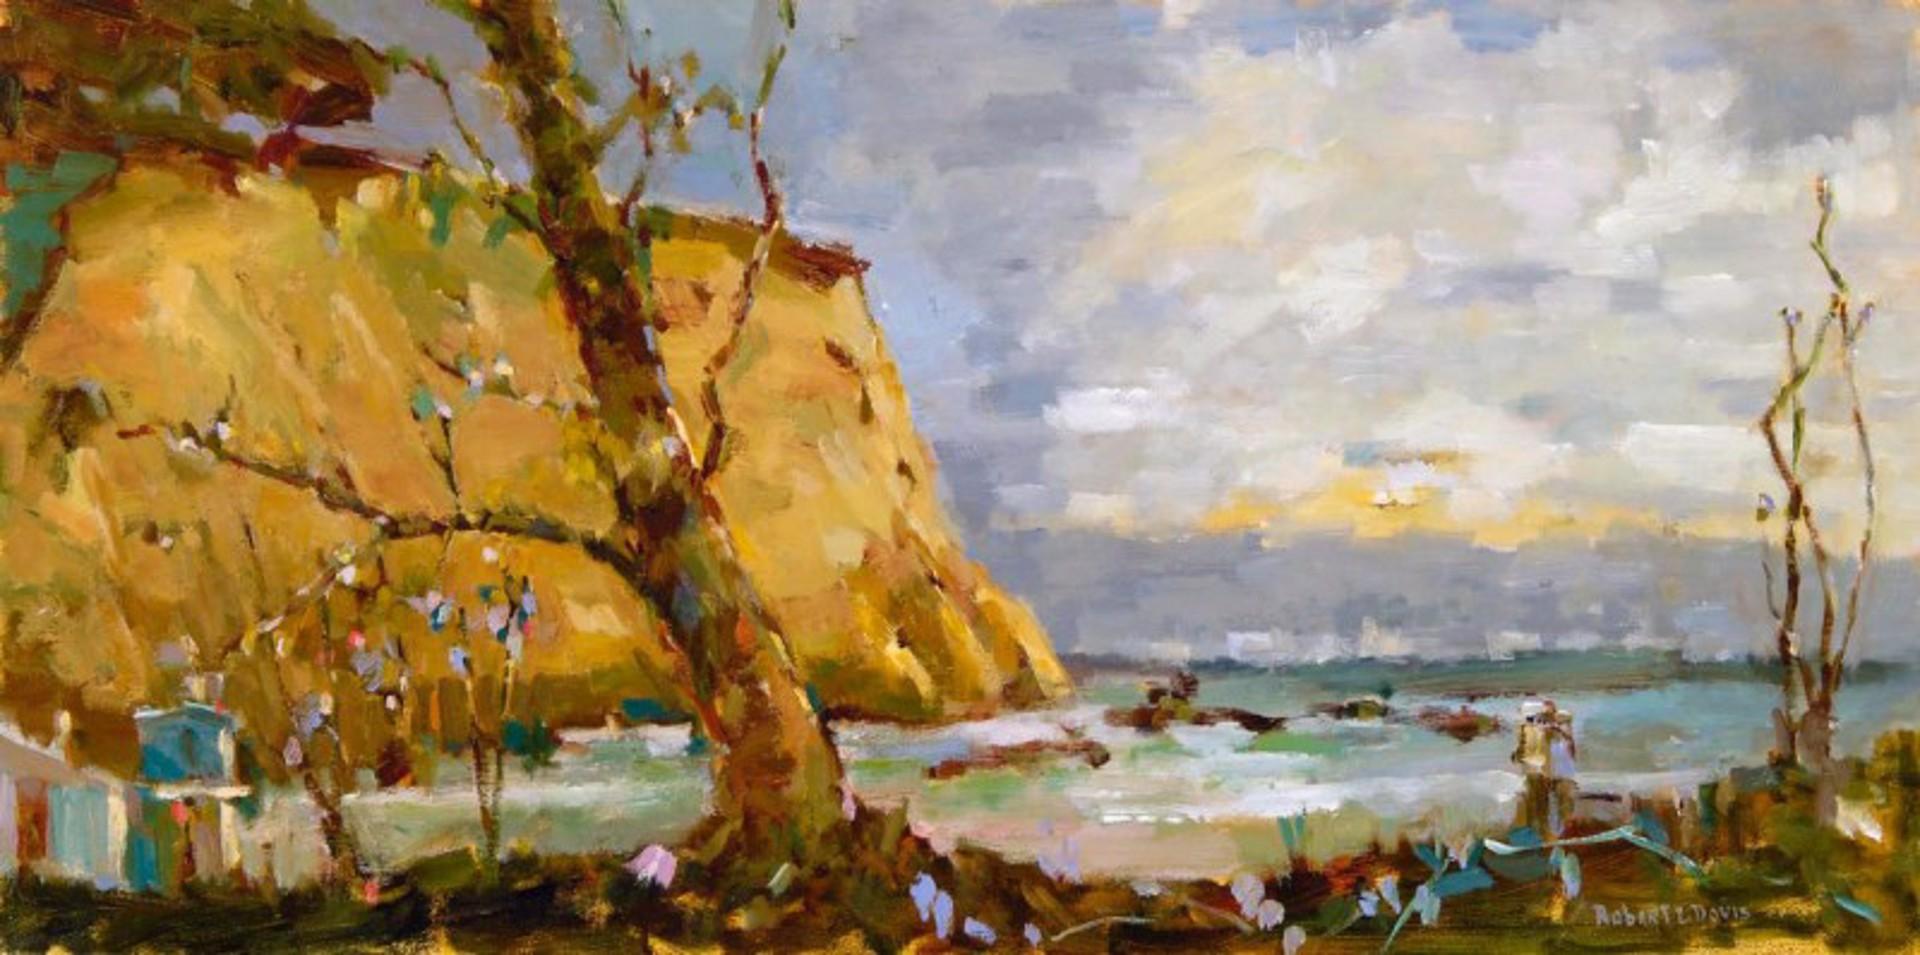 Crystal Cove II by Robert L. Davis